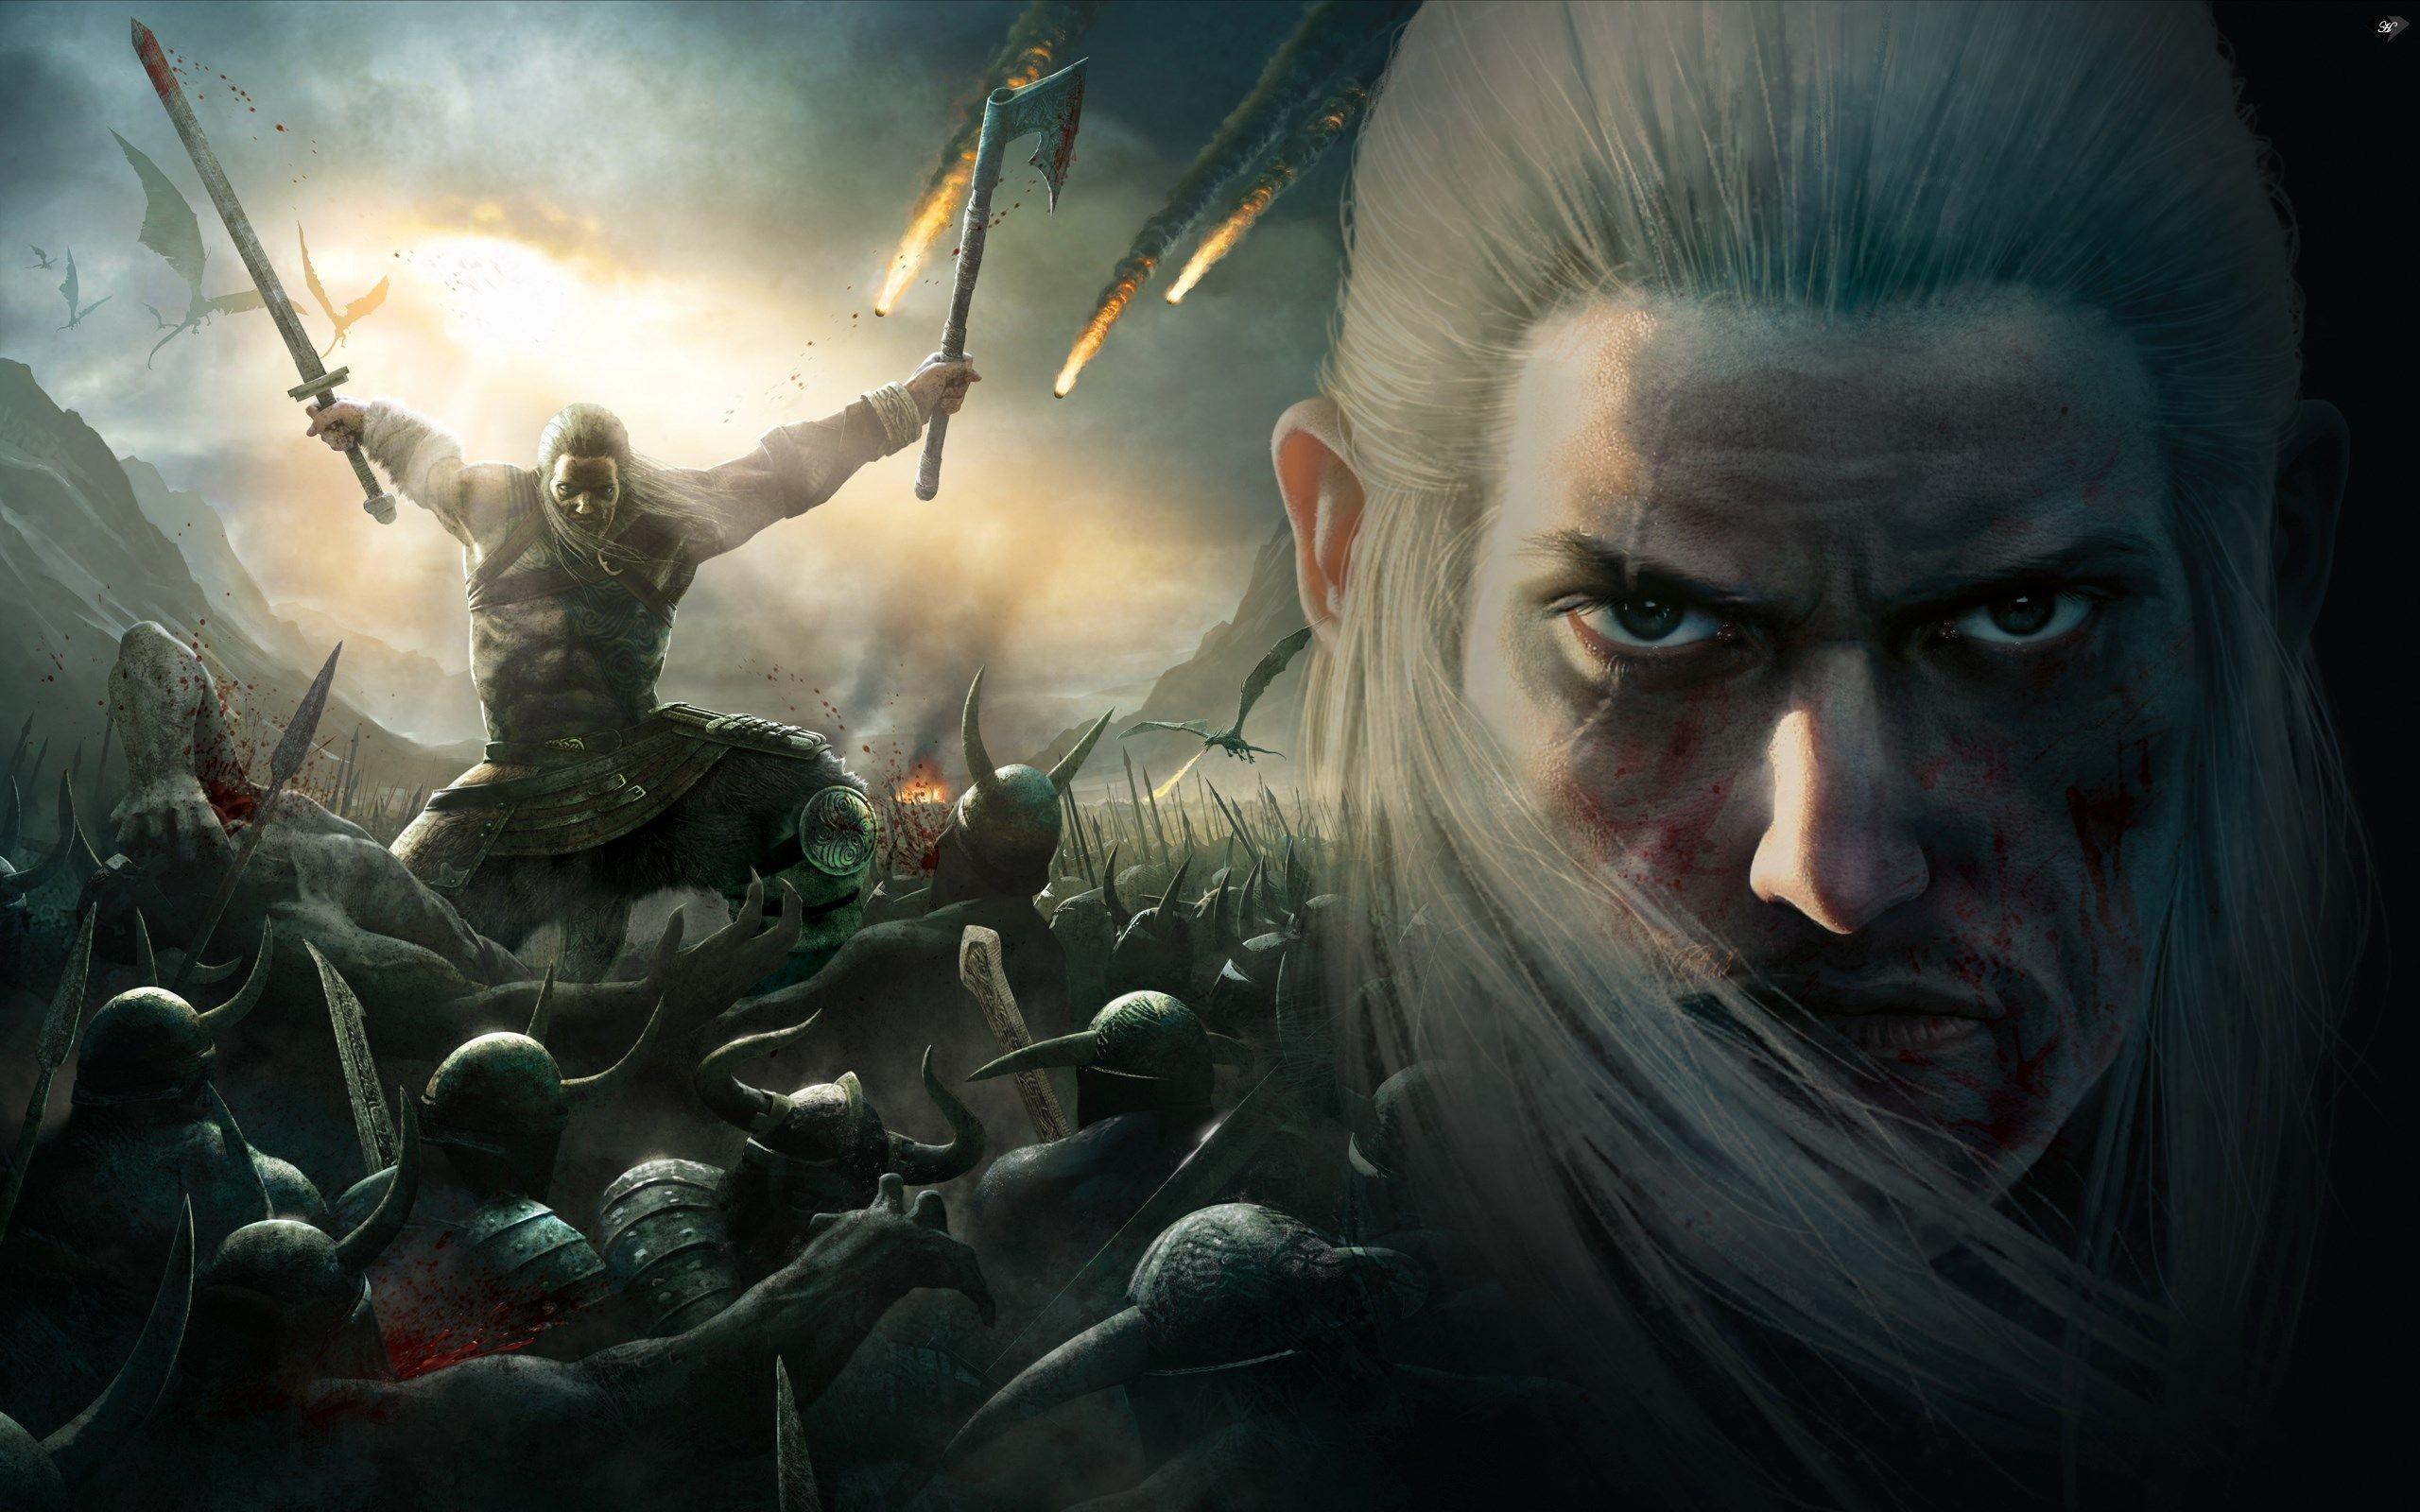 Res: 2560x1600, wallpaper images viking battle for asgard